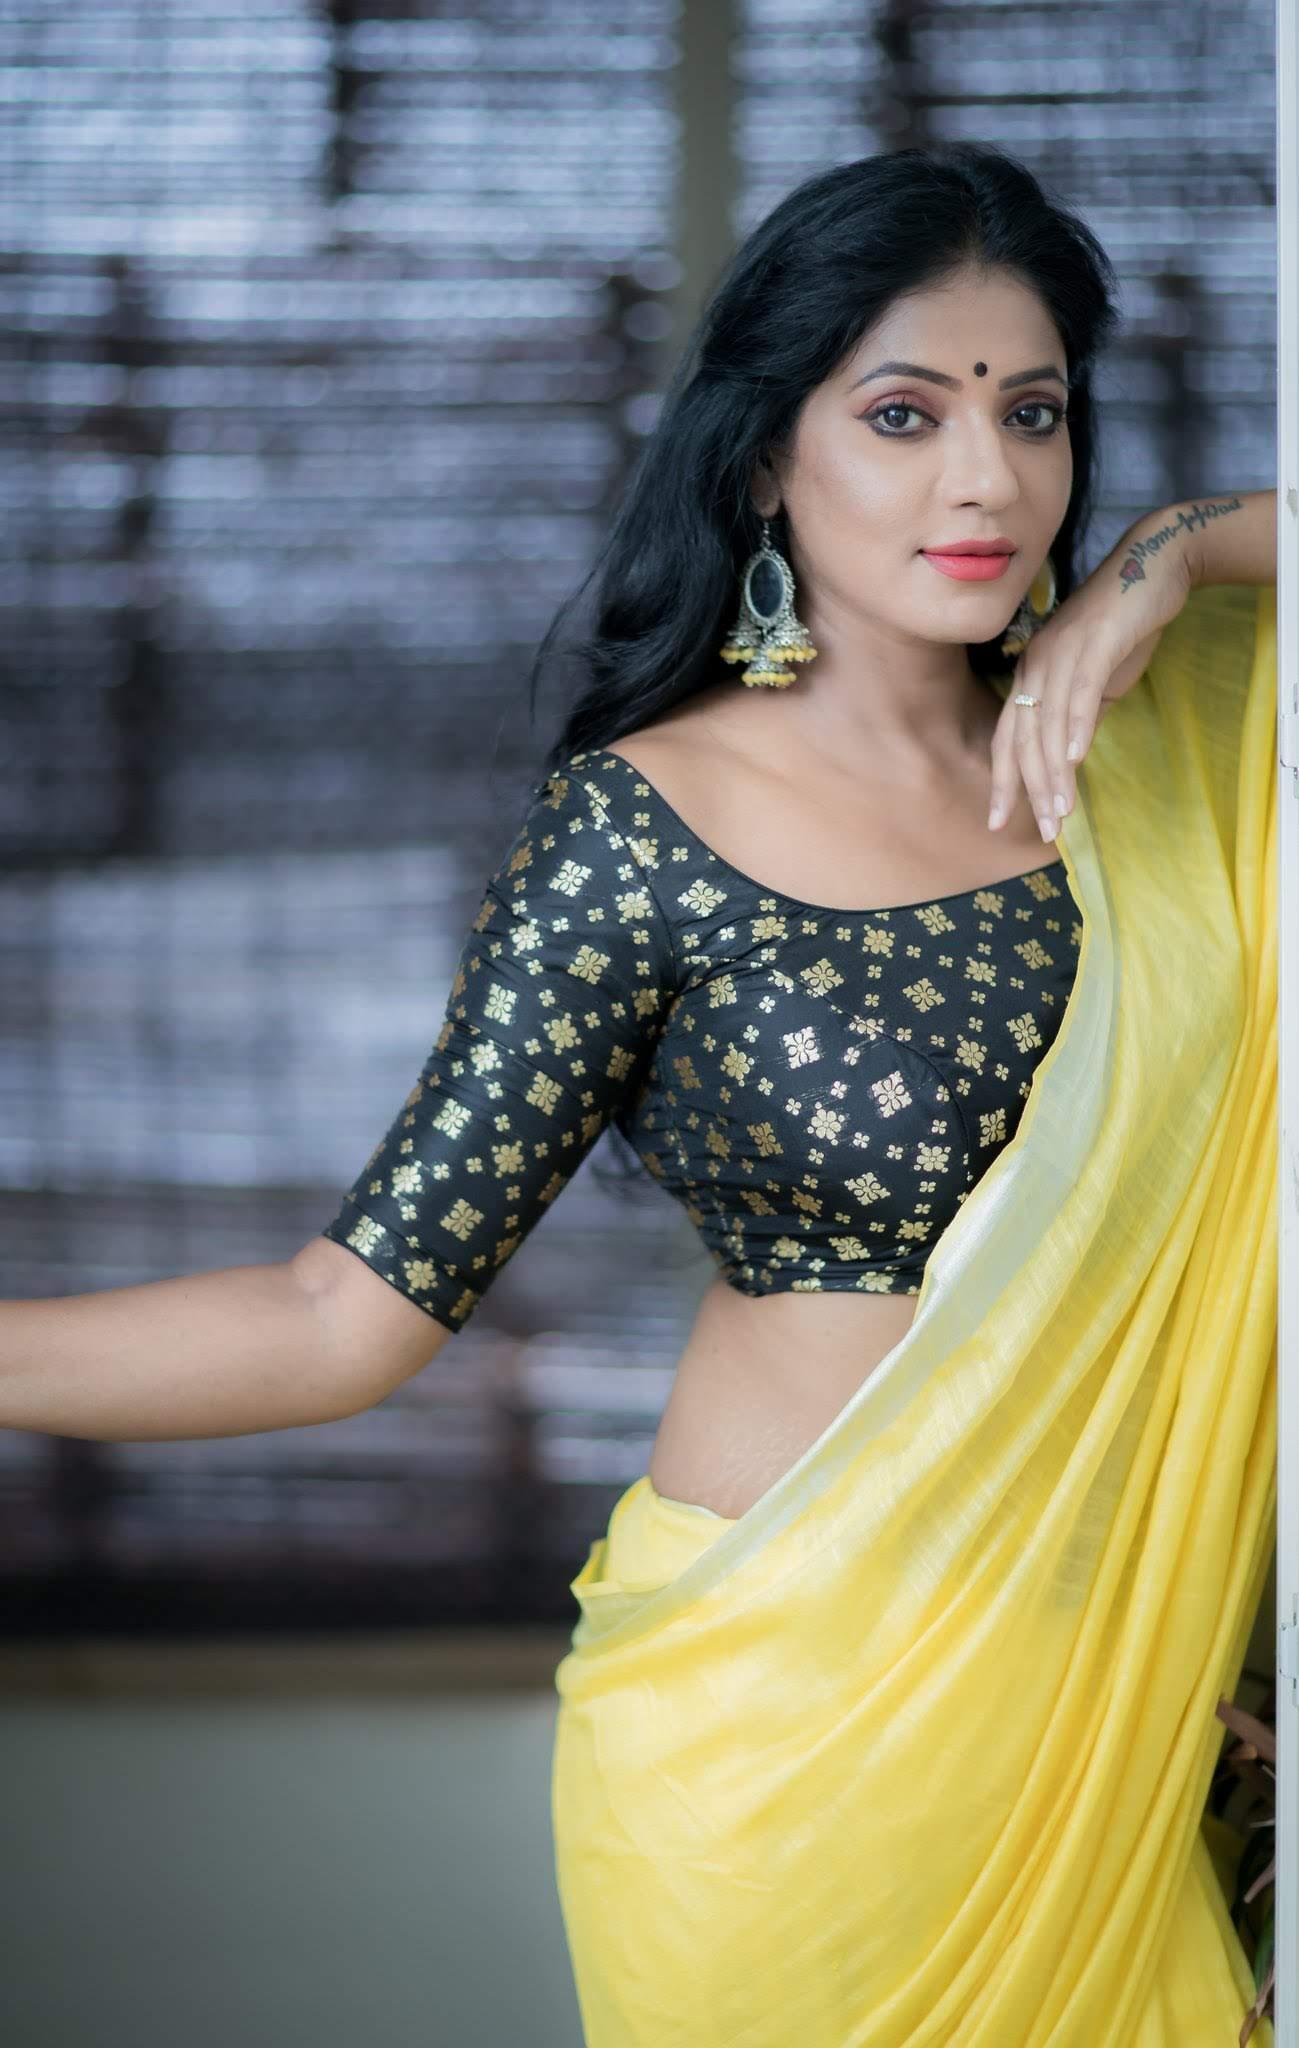 reshma_pasupu_latest_36455